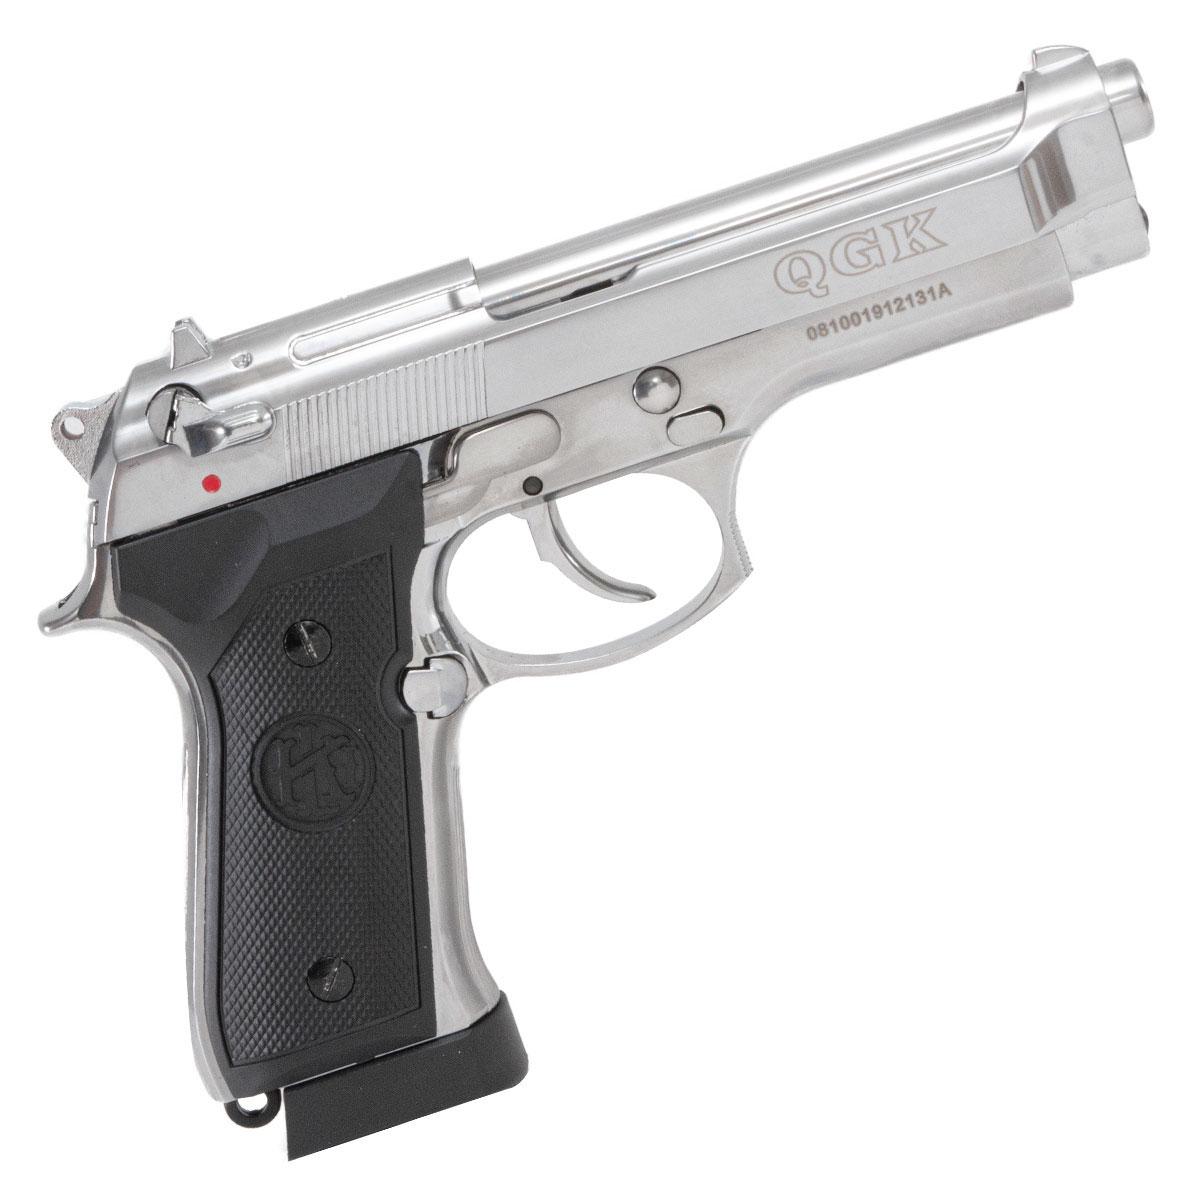 Pistola de Pressão QGK KL92 S GBB 4.5mm